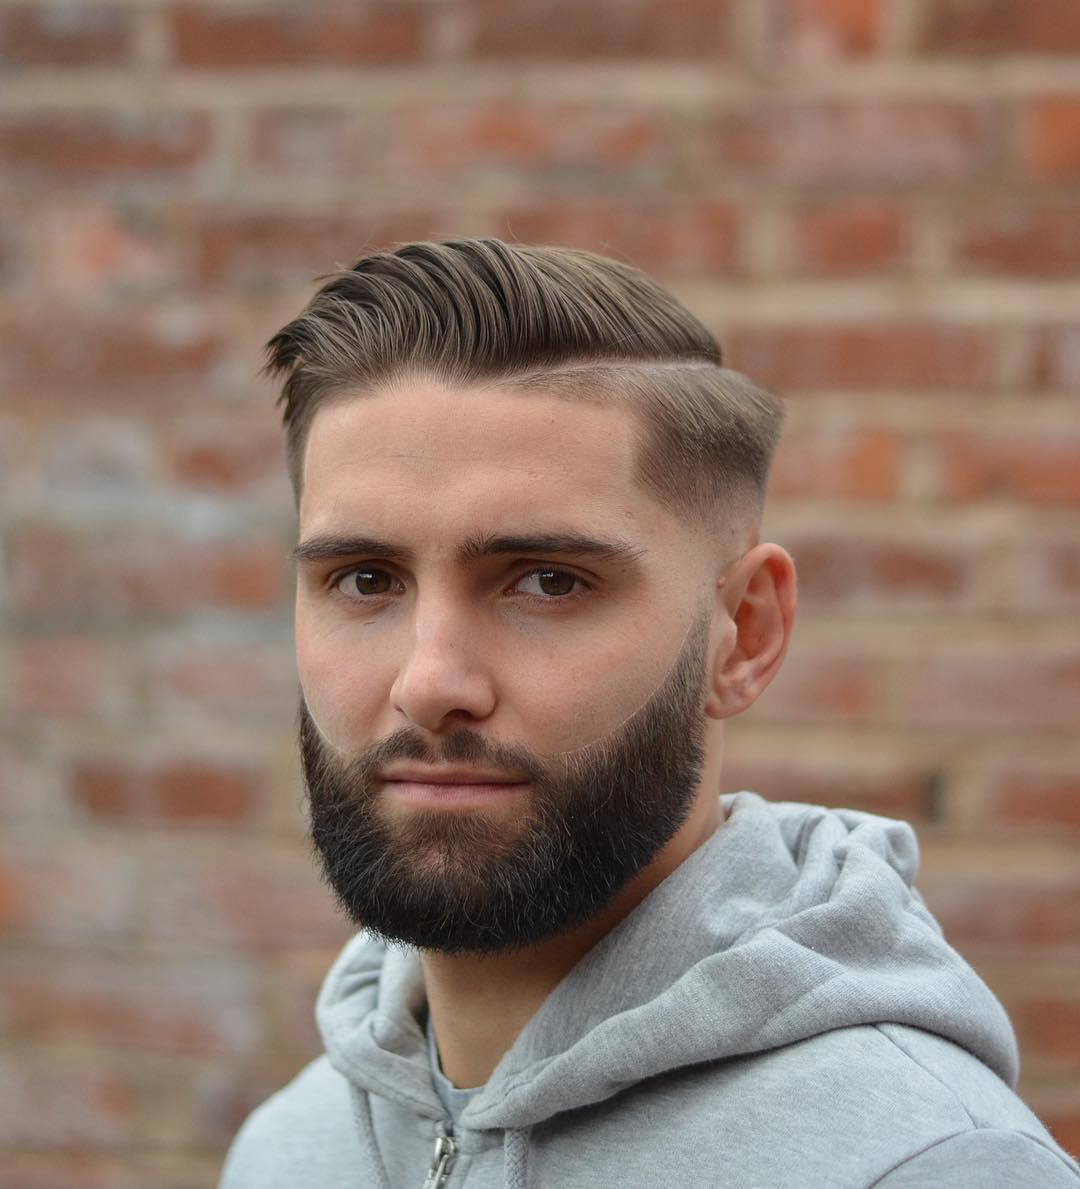 mattjbarbers comb over pompadour haircut